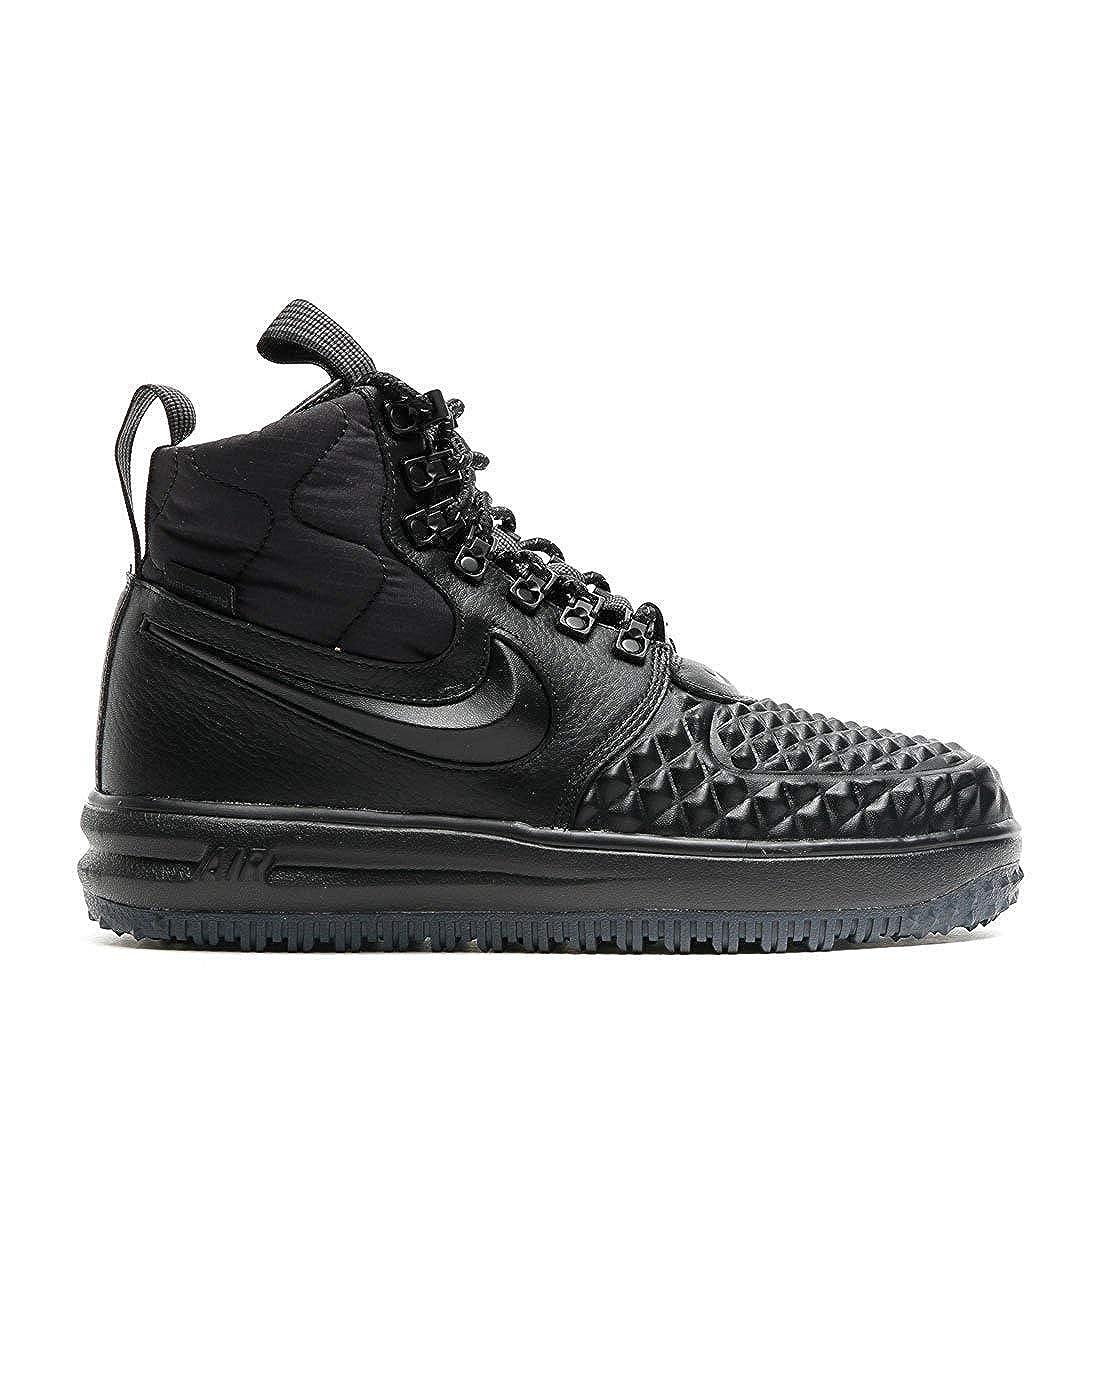 Black Black-white Nike Men's LF1 Duckboot '17 Casual shoes